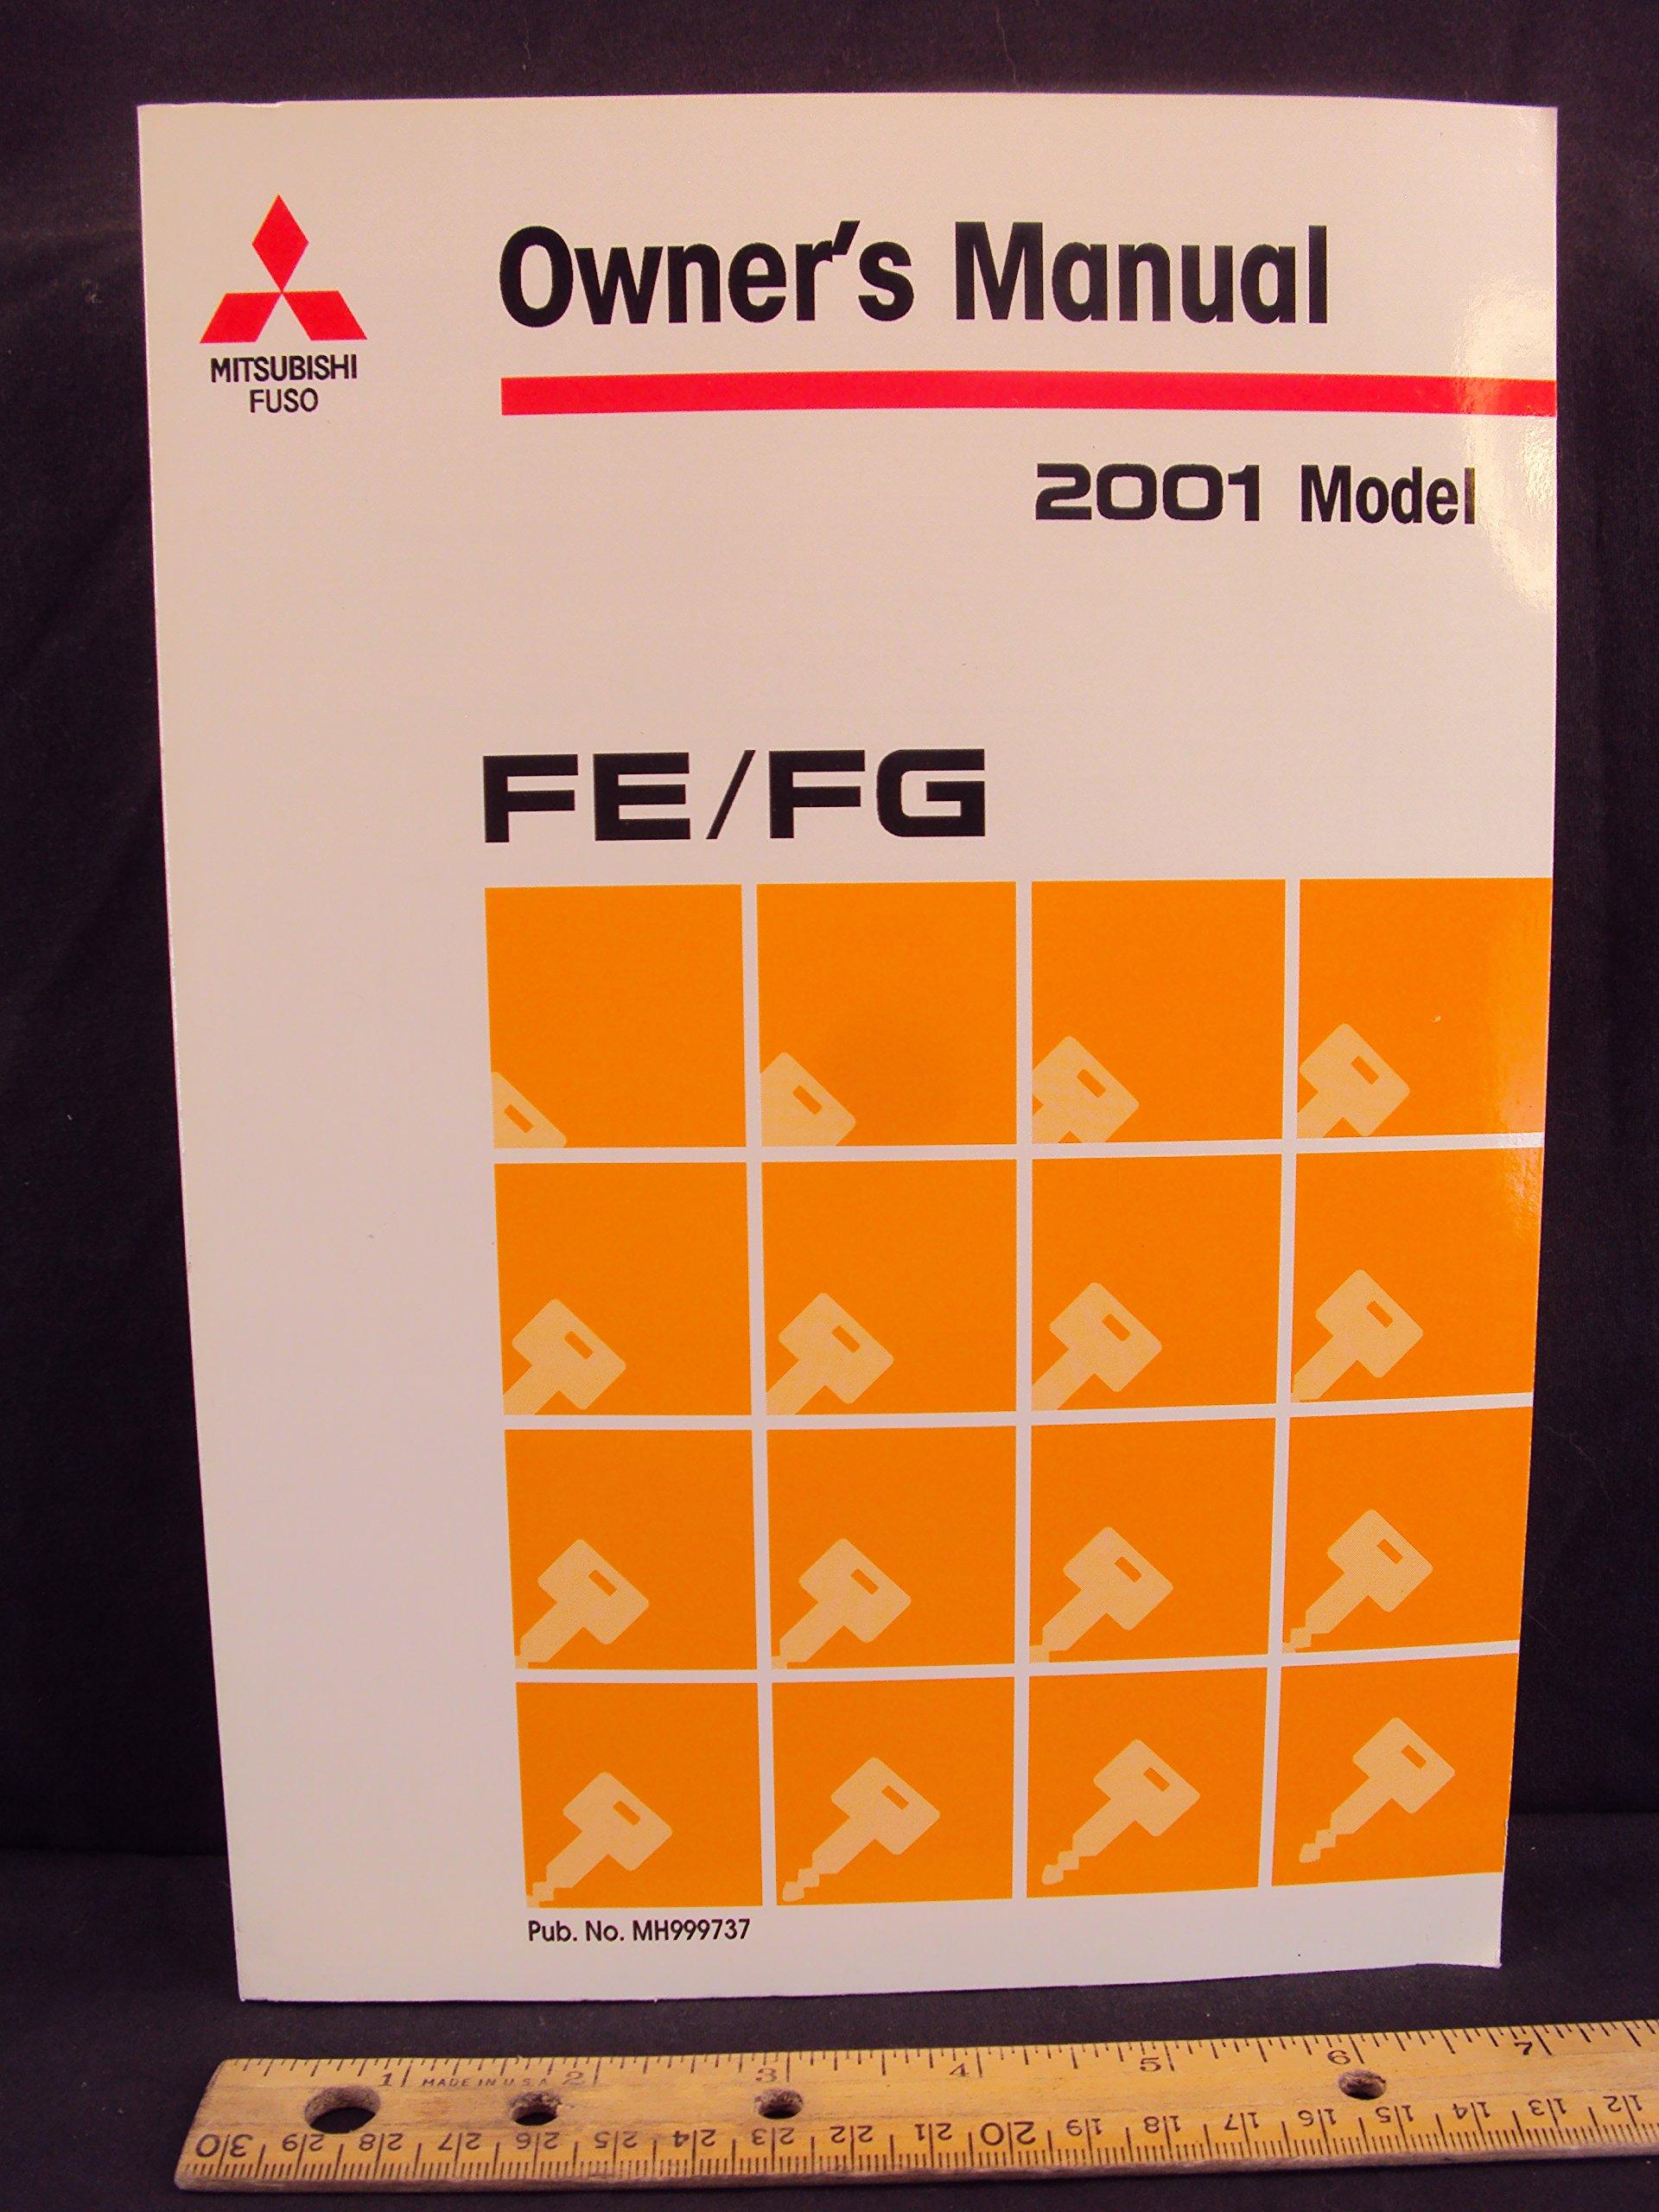 2001 Mitsubishi Fuso FE / FG Truck Owners Manual: Mitsubishi Fuso Truck of  America: Amazon.com: Books